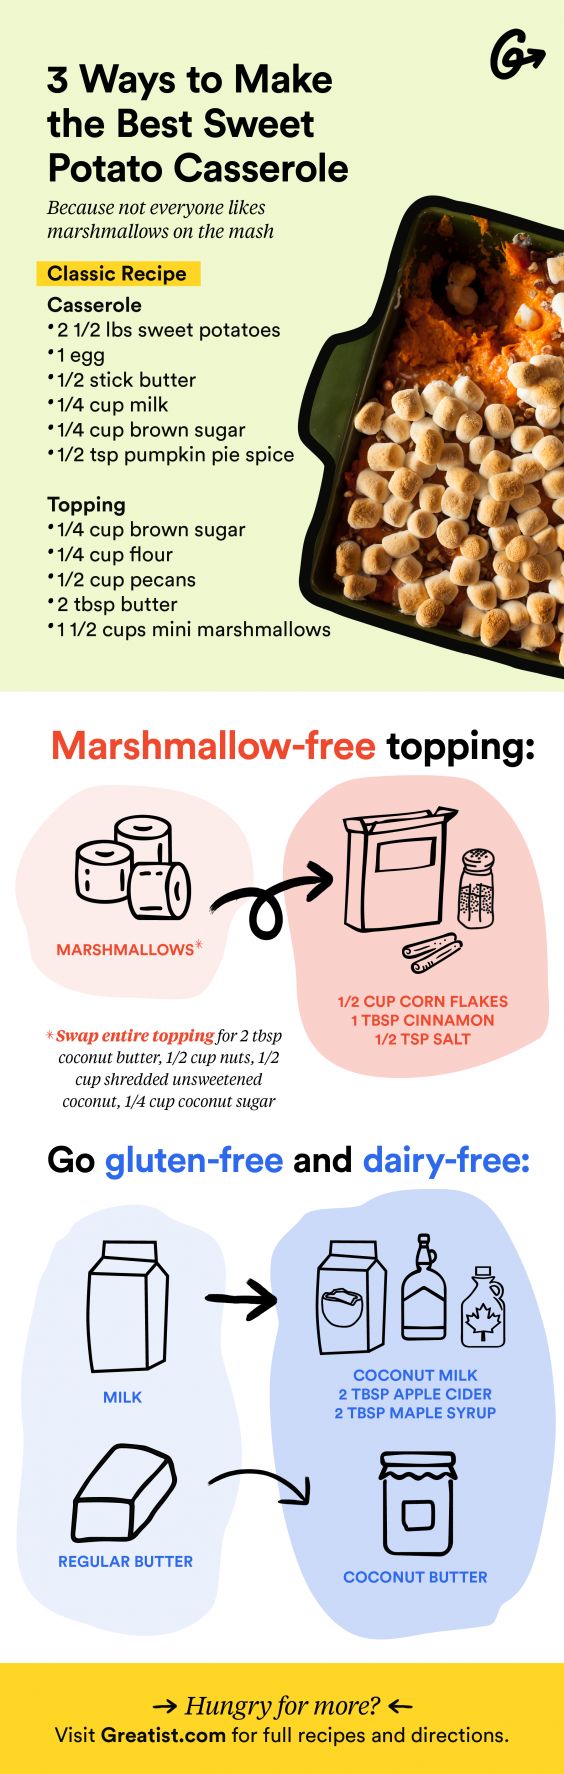 Sweet Potato Casserole Recipe Done 3 Ways | Greatist